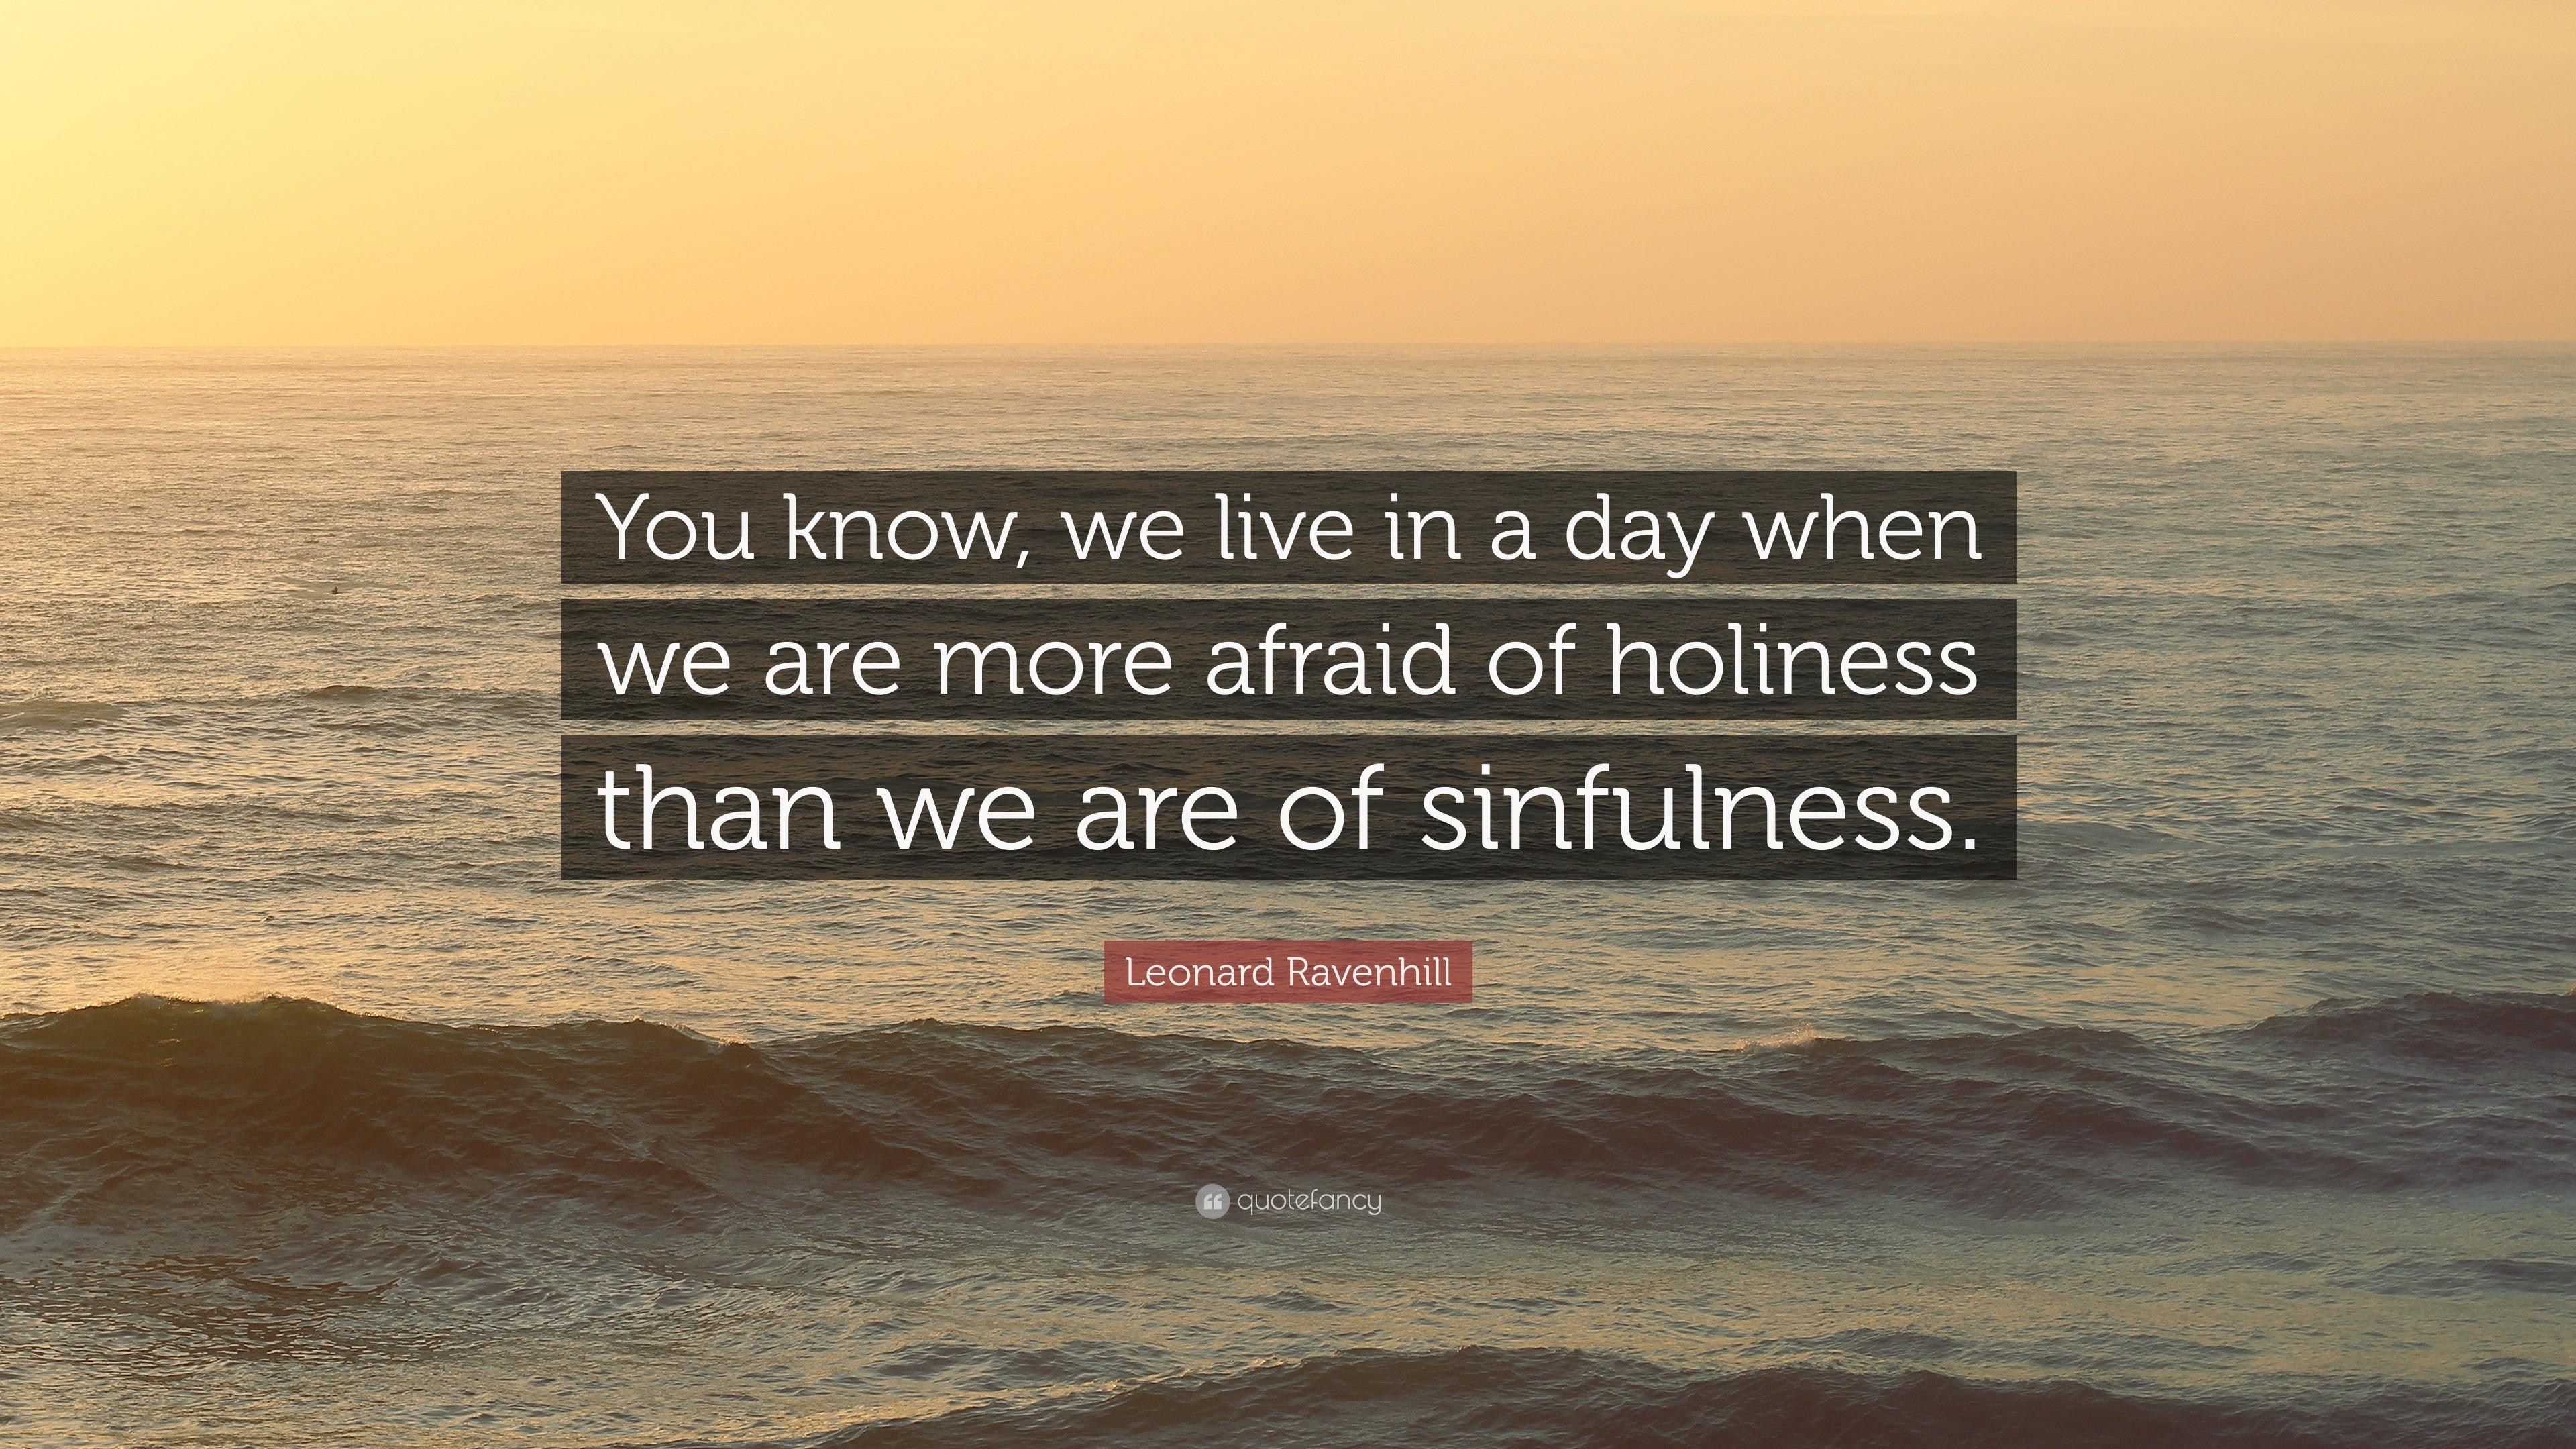 Imagini pentru leonard ravenhill holiness quotes